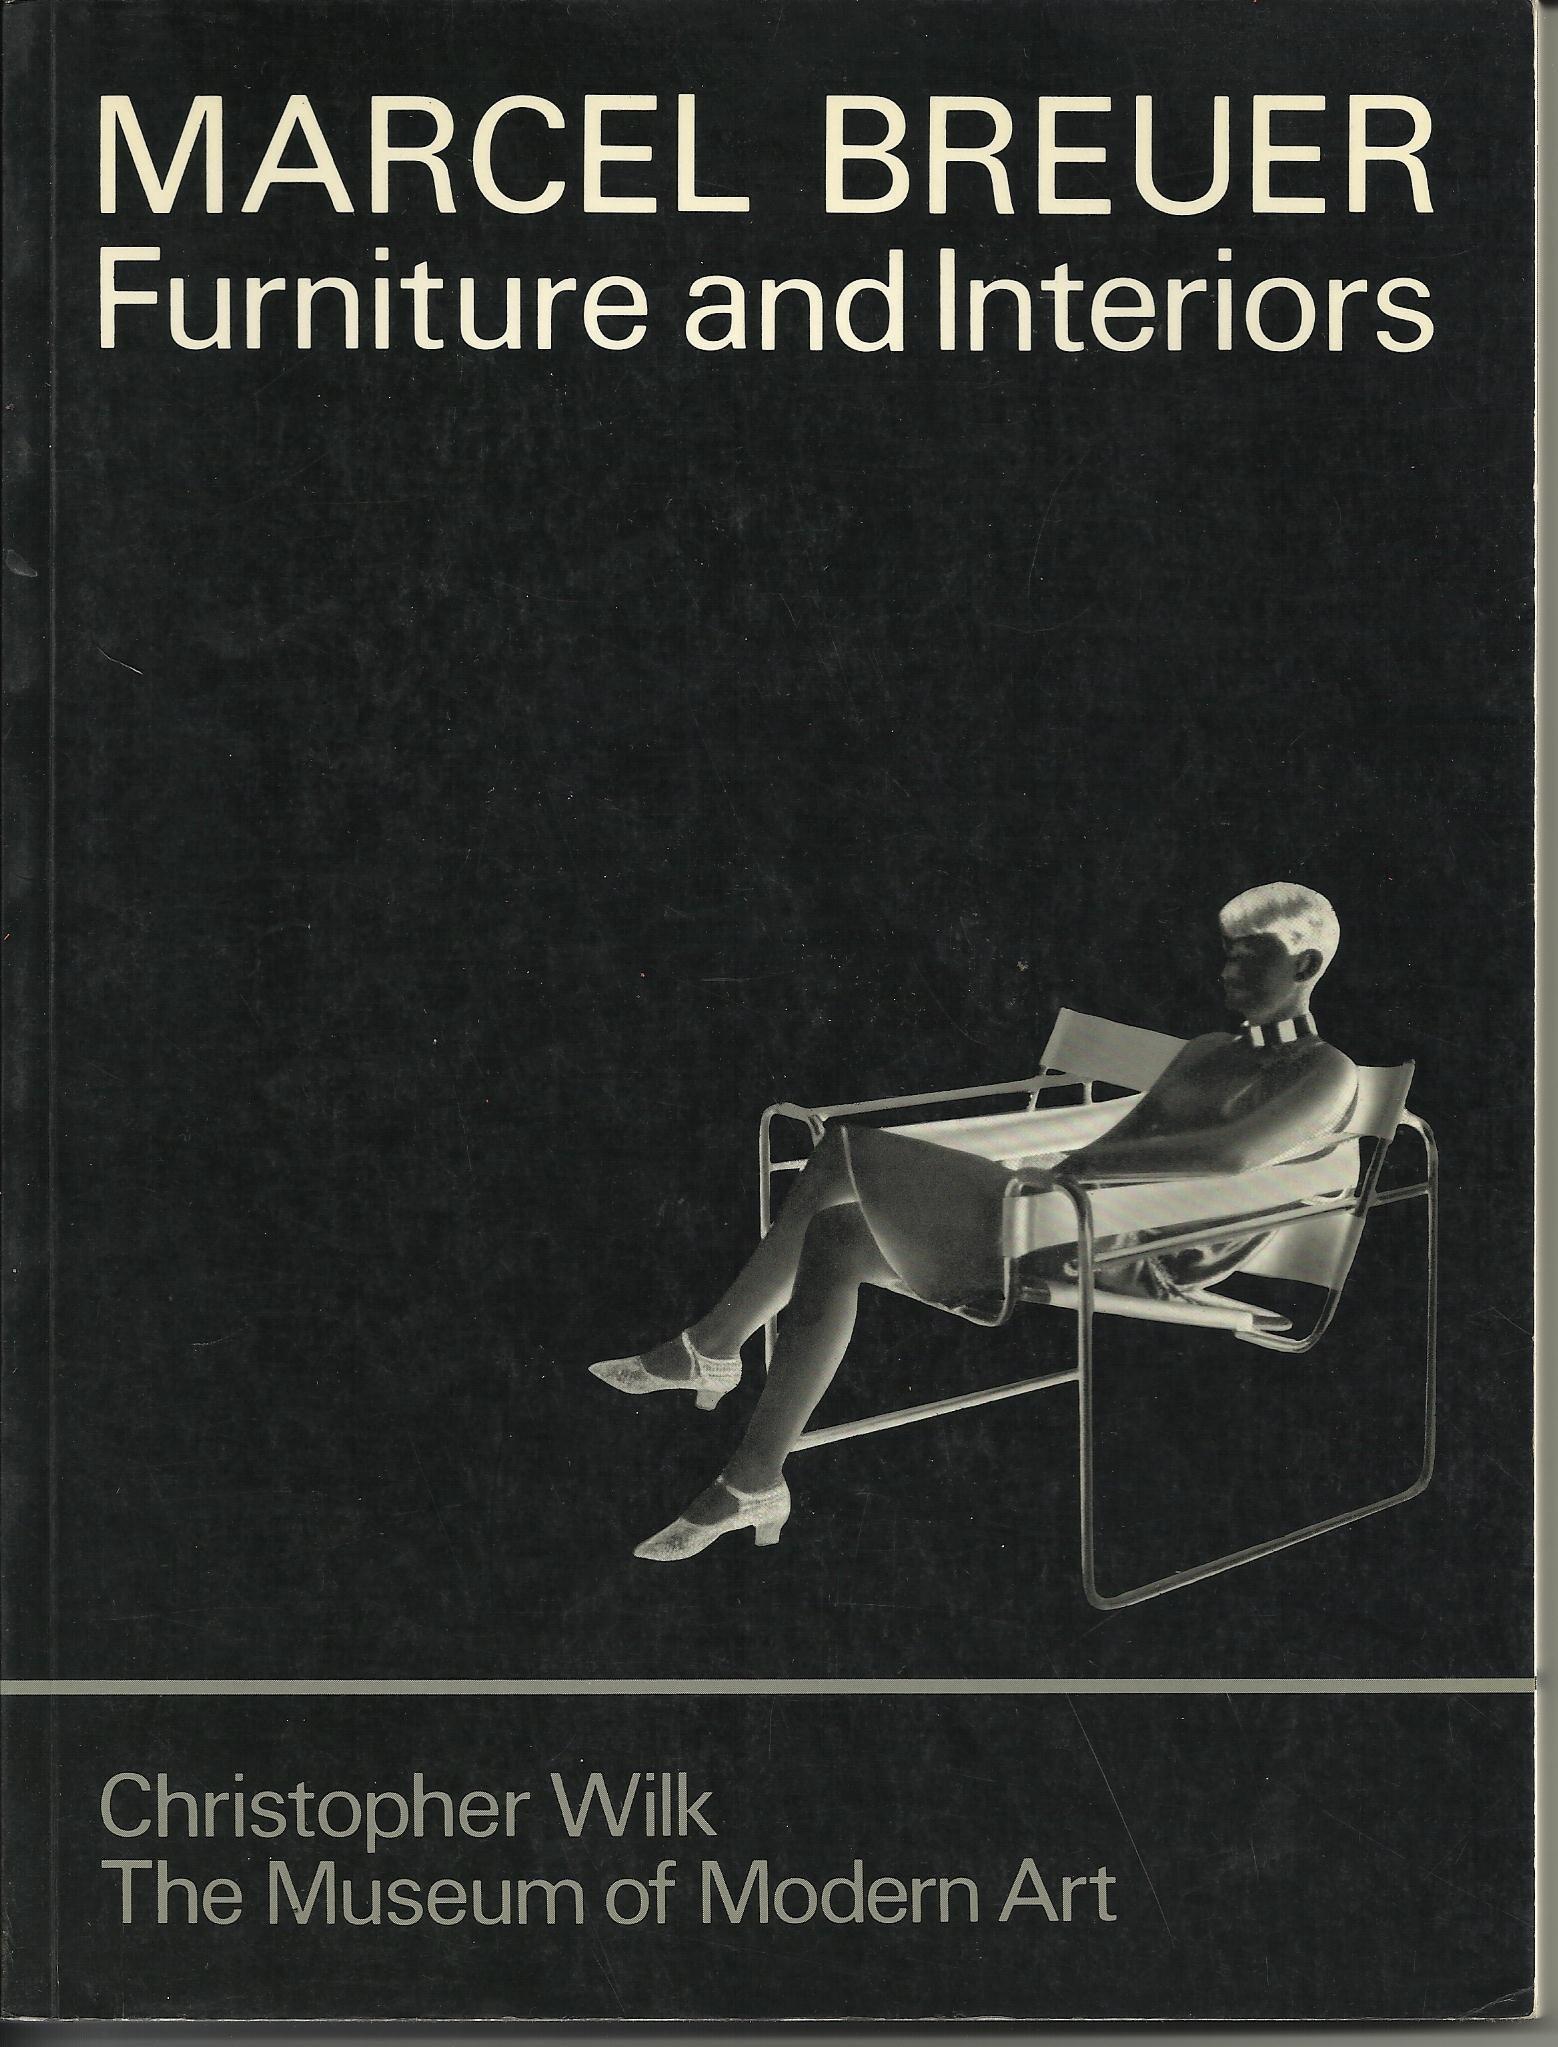 marcel-breuer-furniture-and-interiors